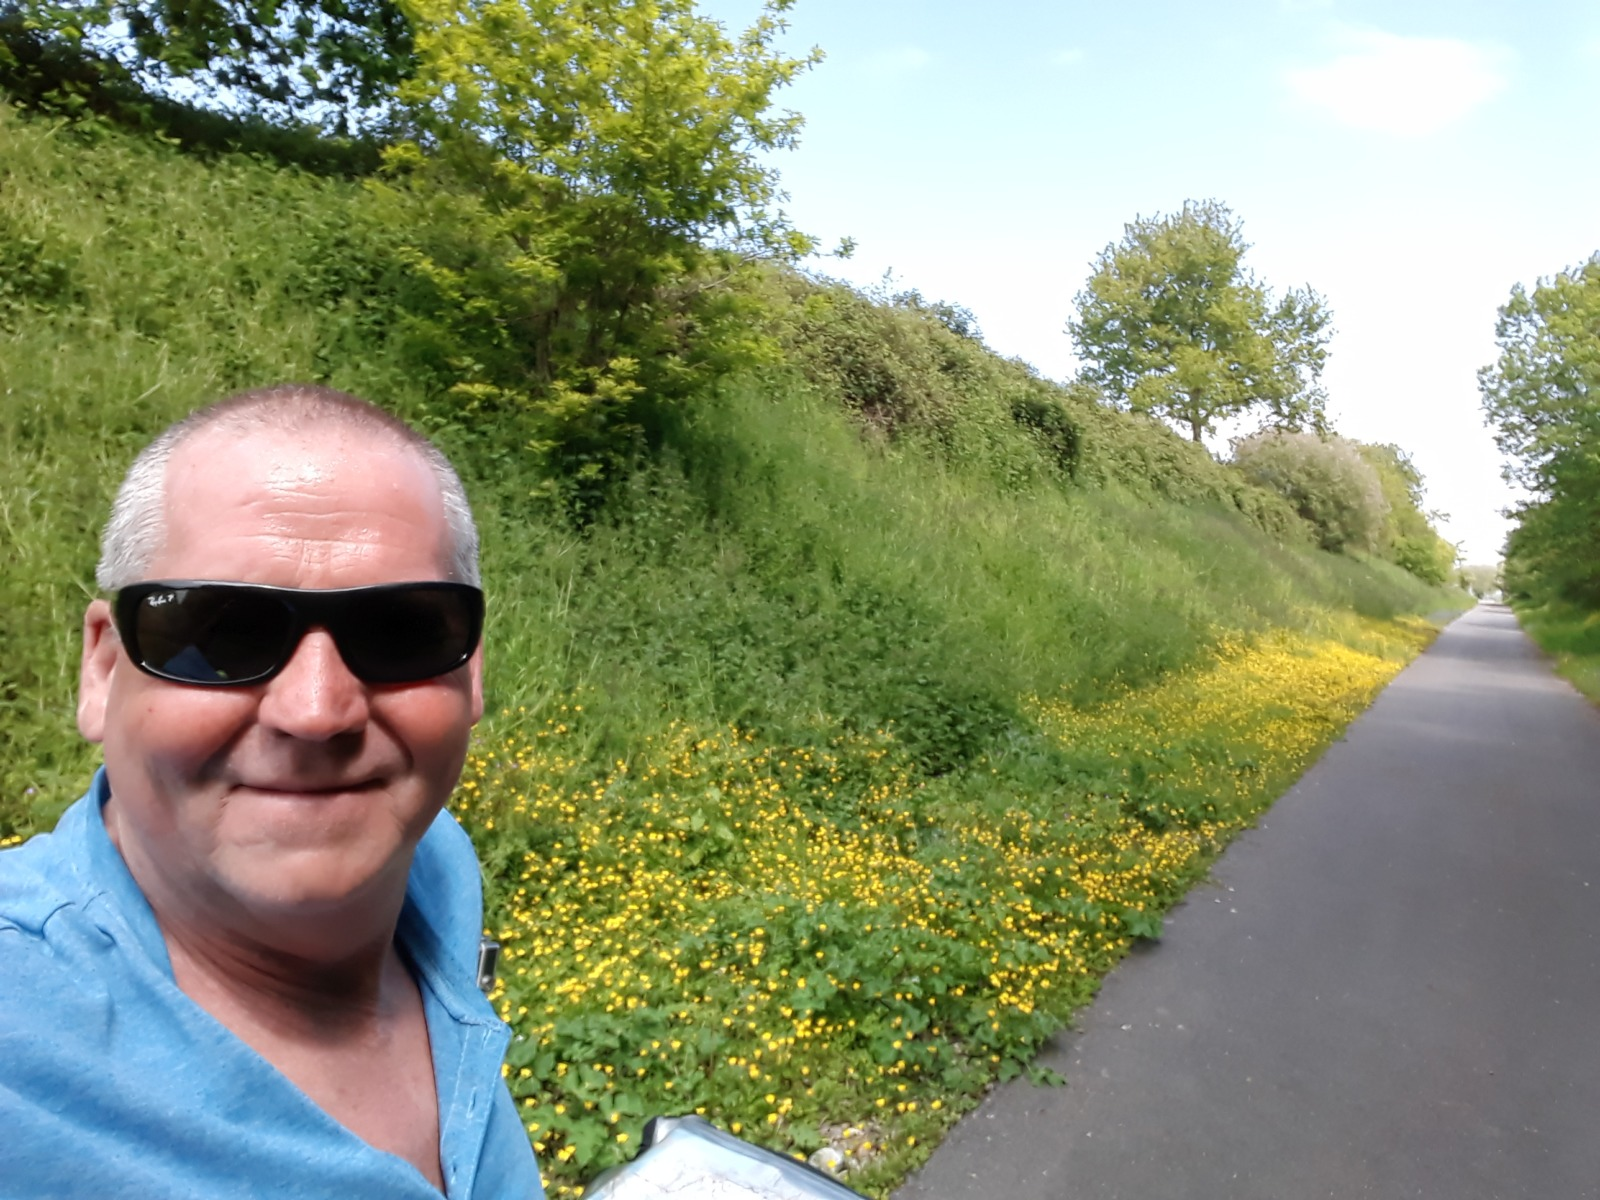 Man path flowers